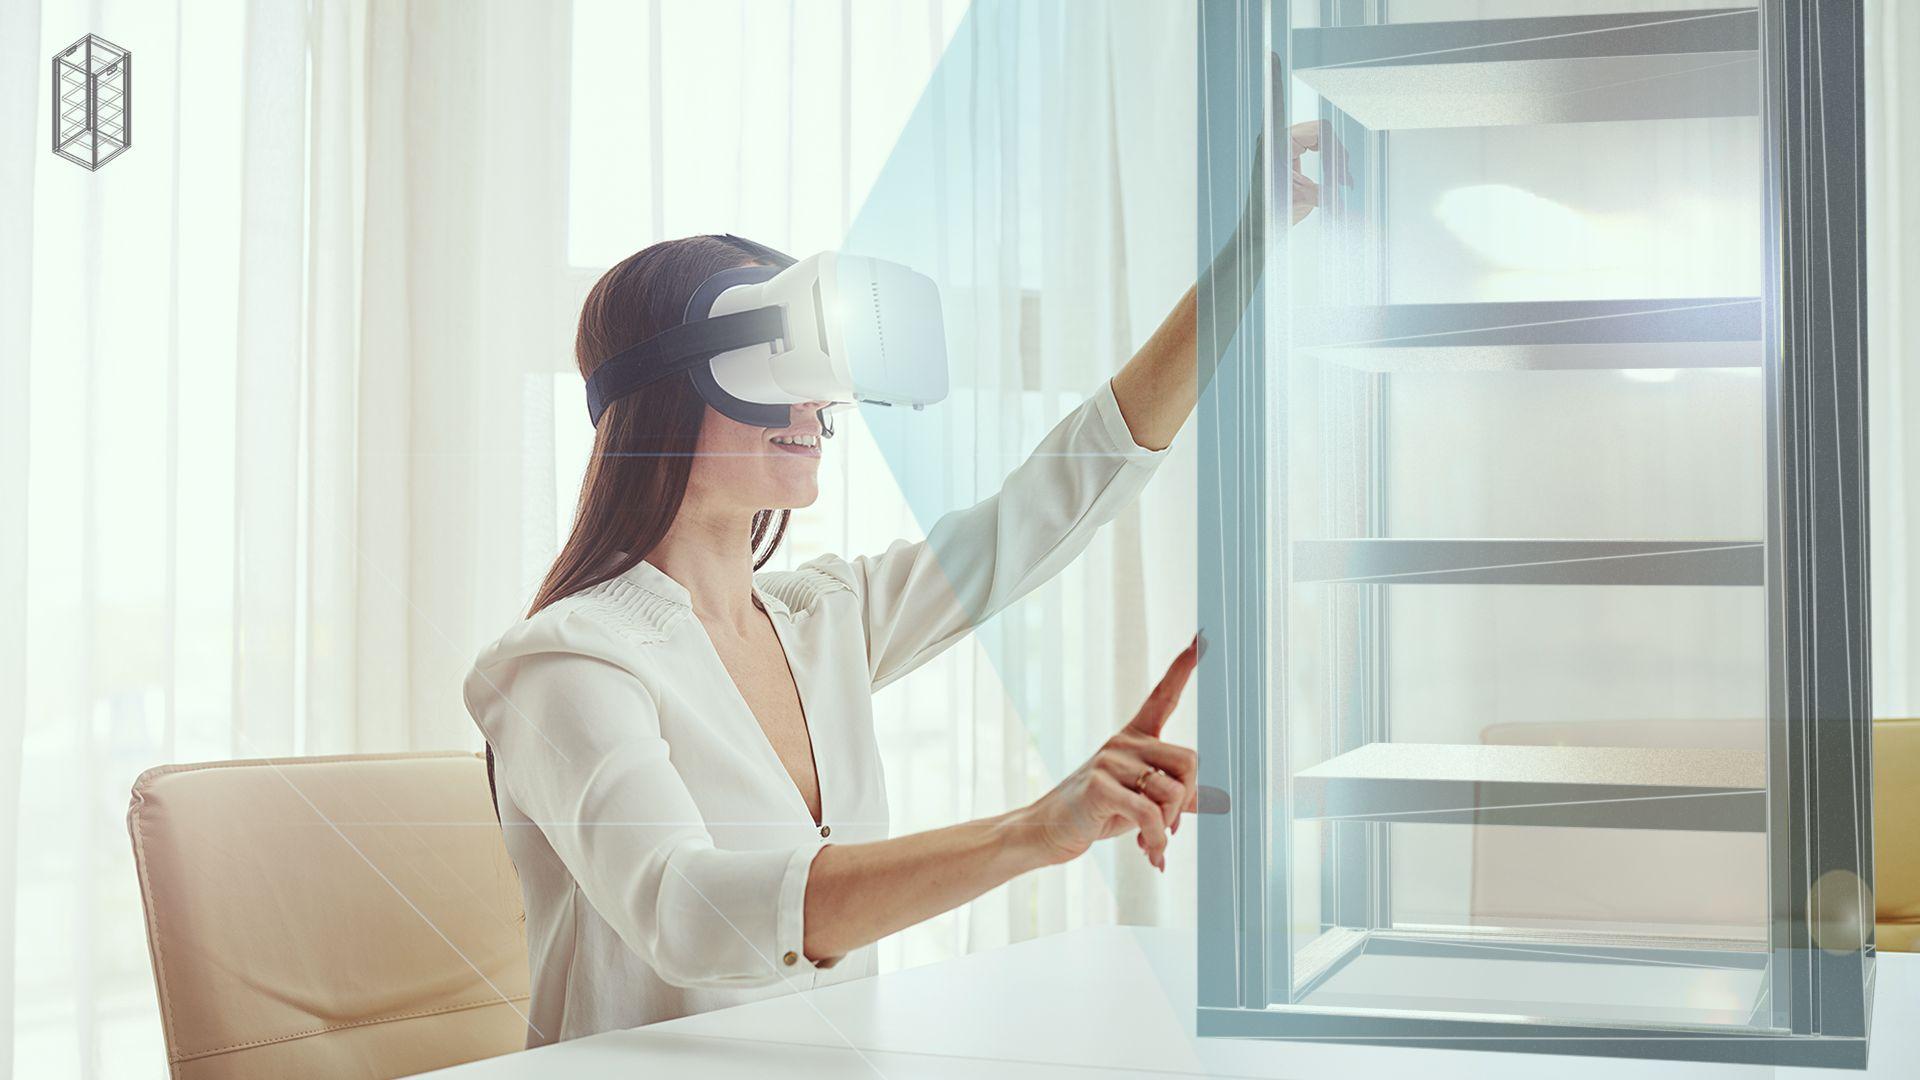 Elektronikschrank-Konfiguration im virtuellen Raum